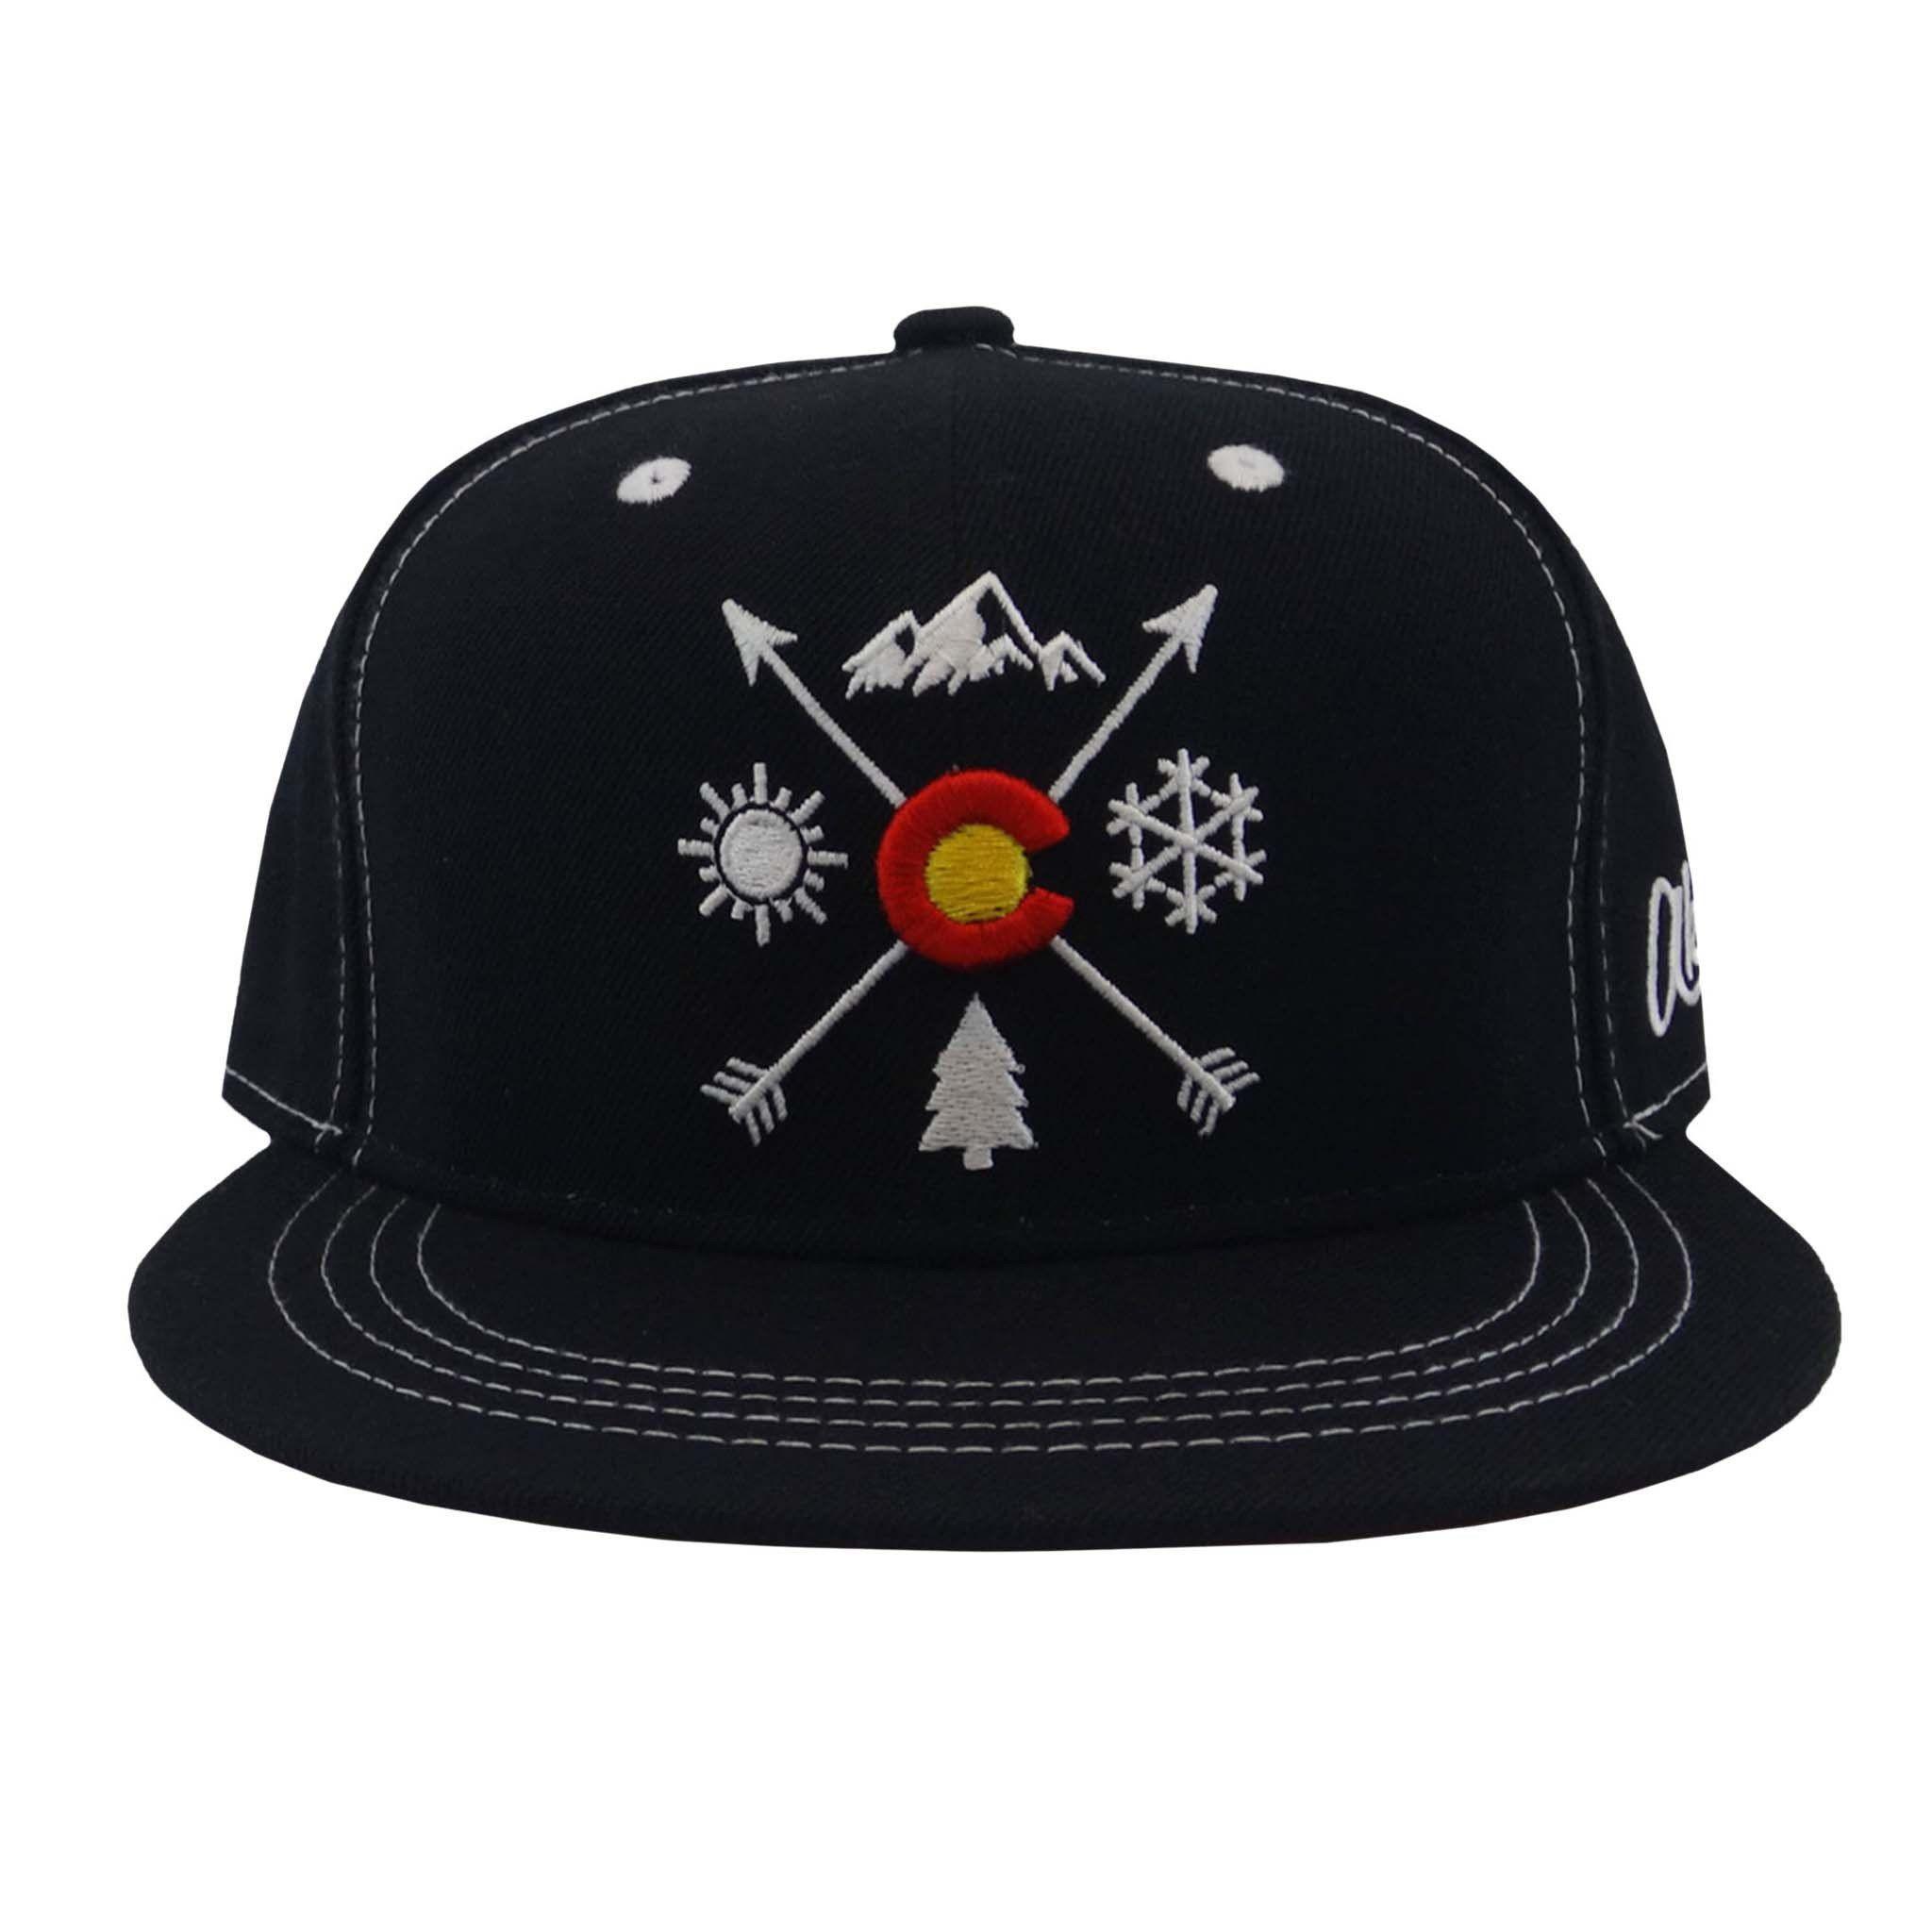 2edabdf15d3 Colorado Arrows Flat Bill Snapback Hat - Black